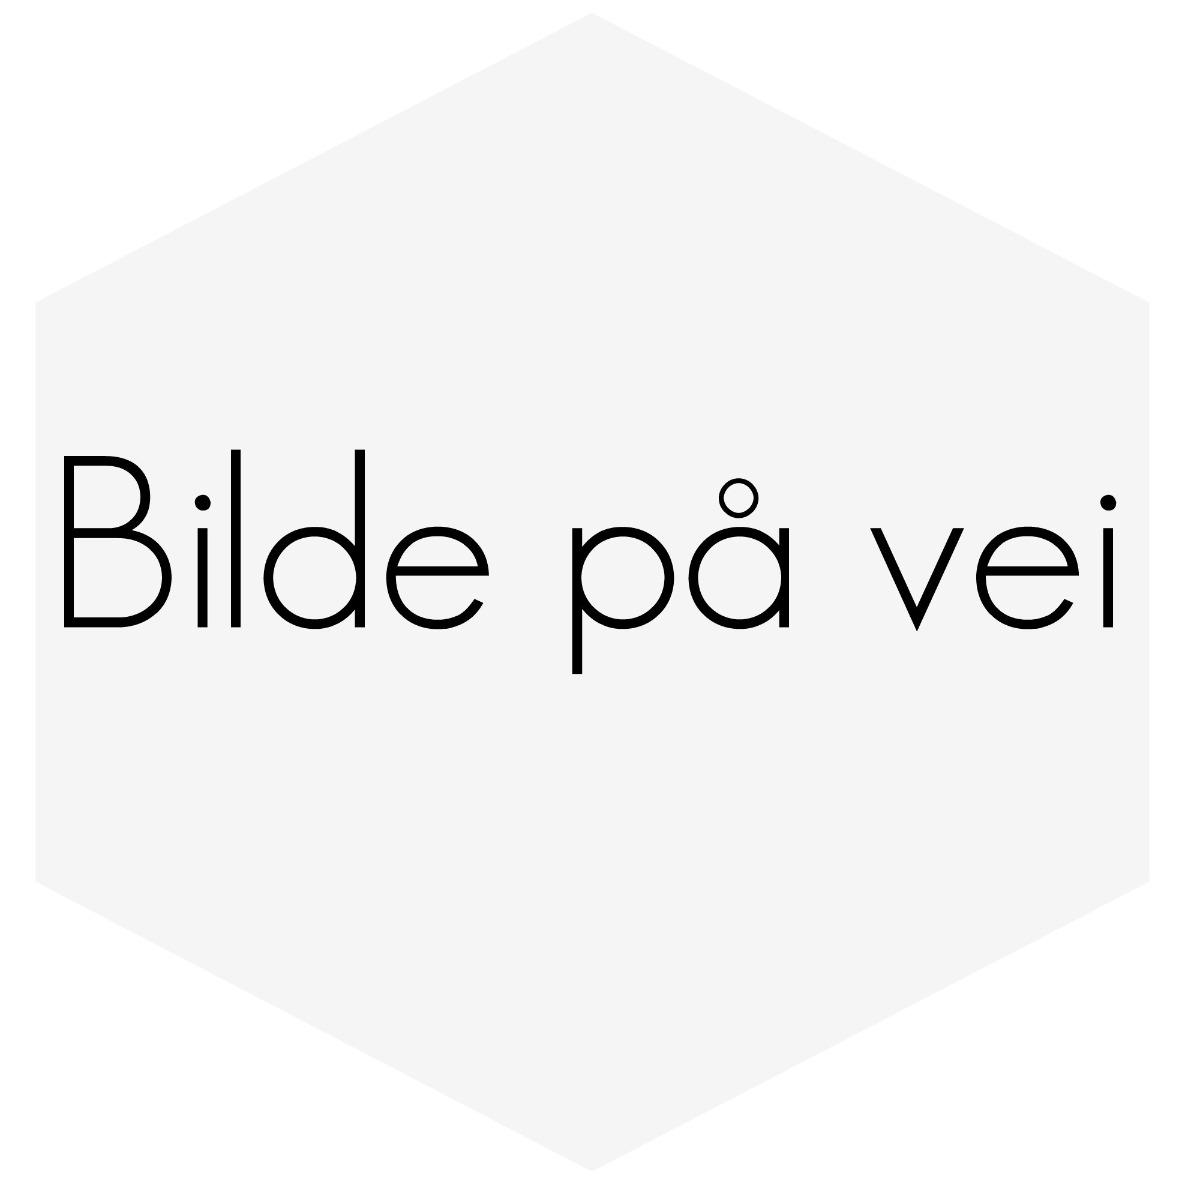 VINDAVISARE SATS SAAB 9/3-98>  PASSER 3 DØRS BILER  28112